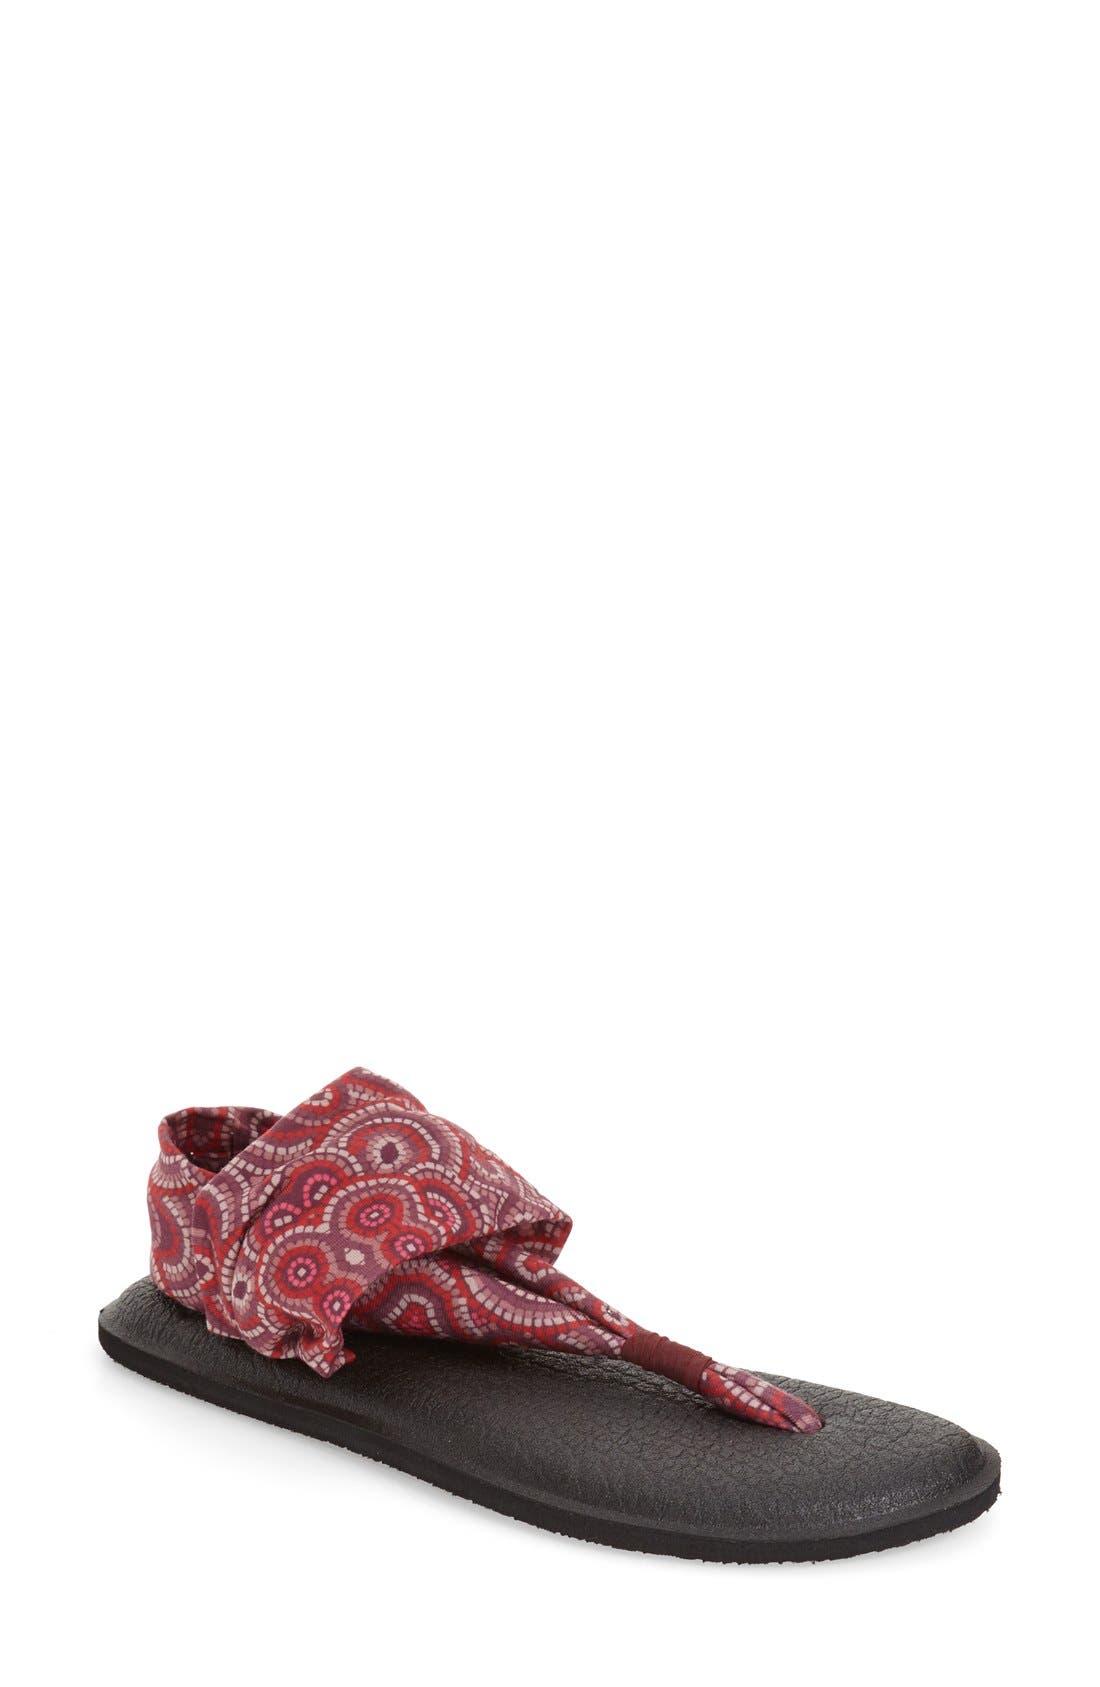 'Yoga Sling 2' Sandal,                             Main thumbnail 22, color,